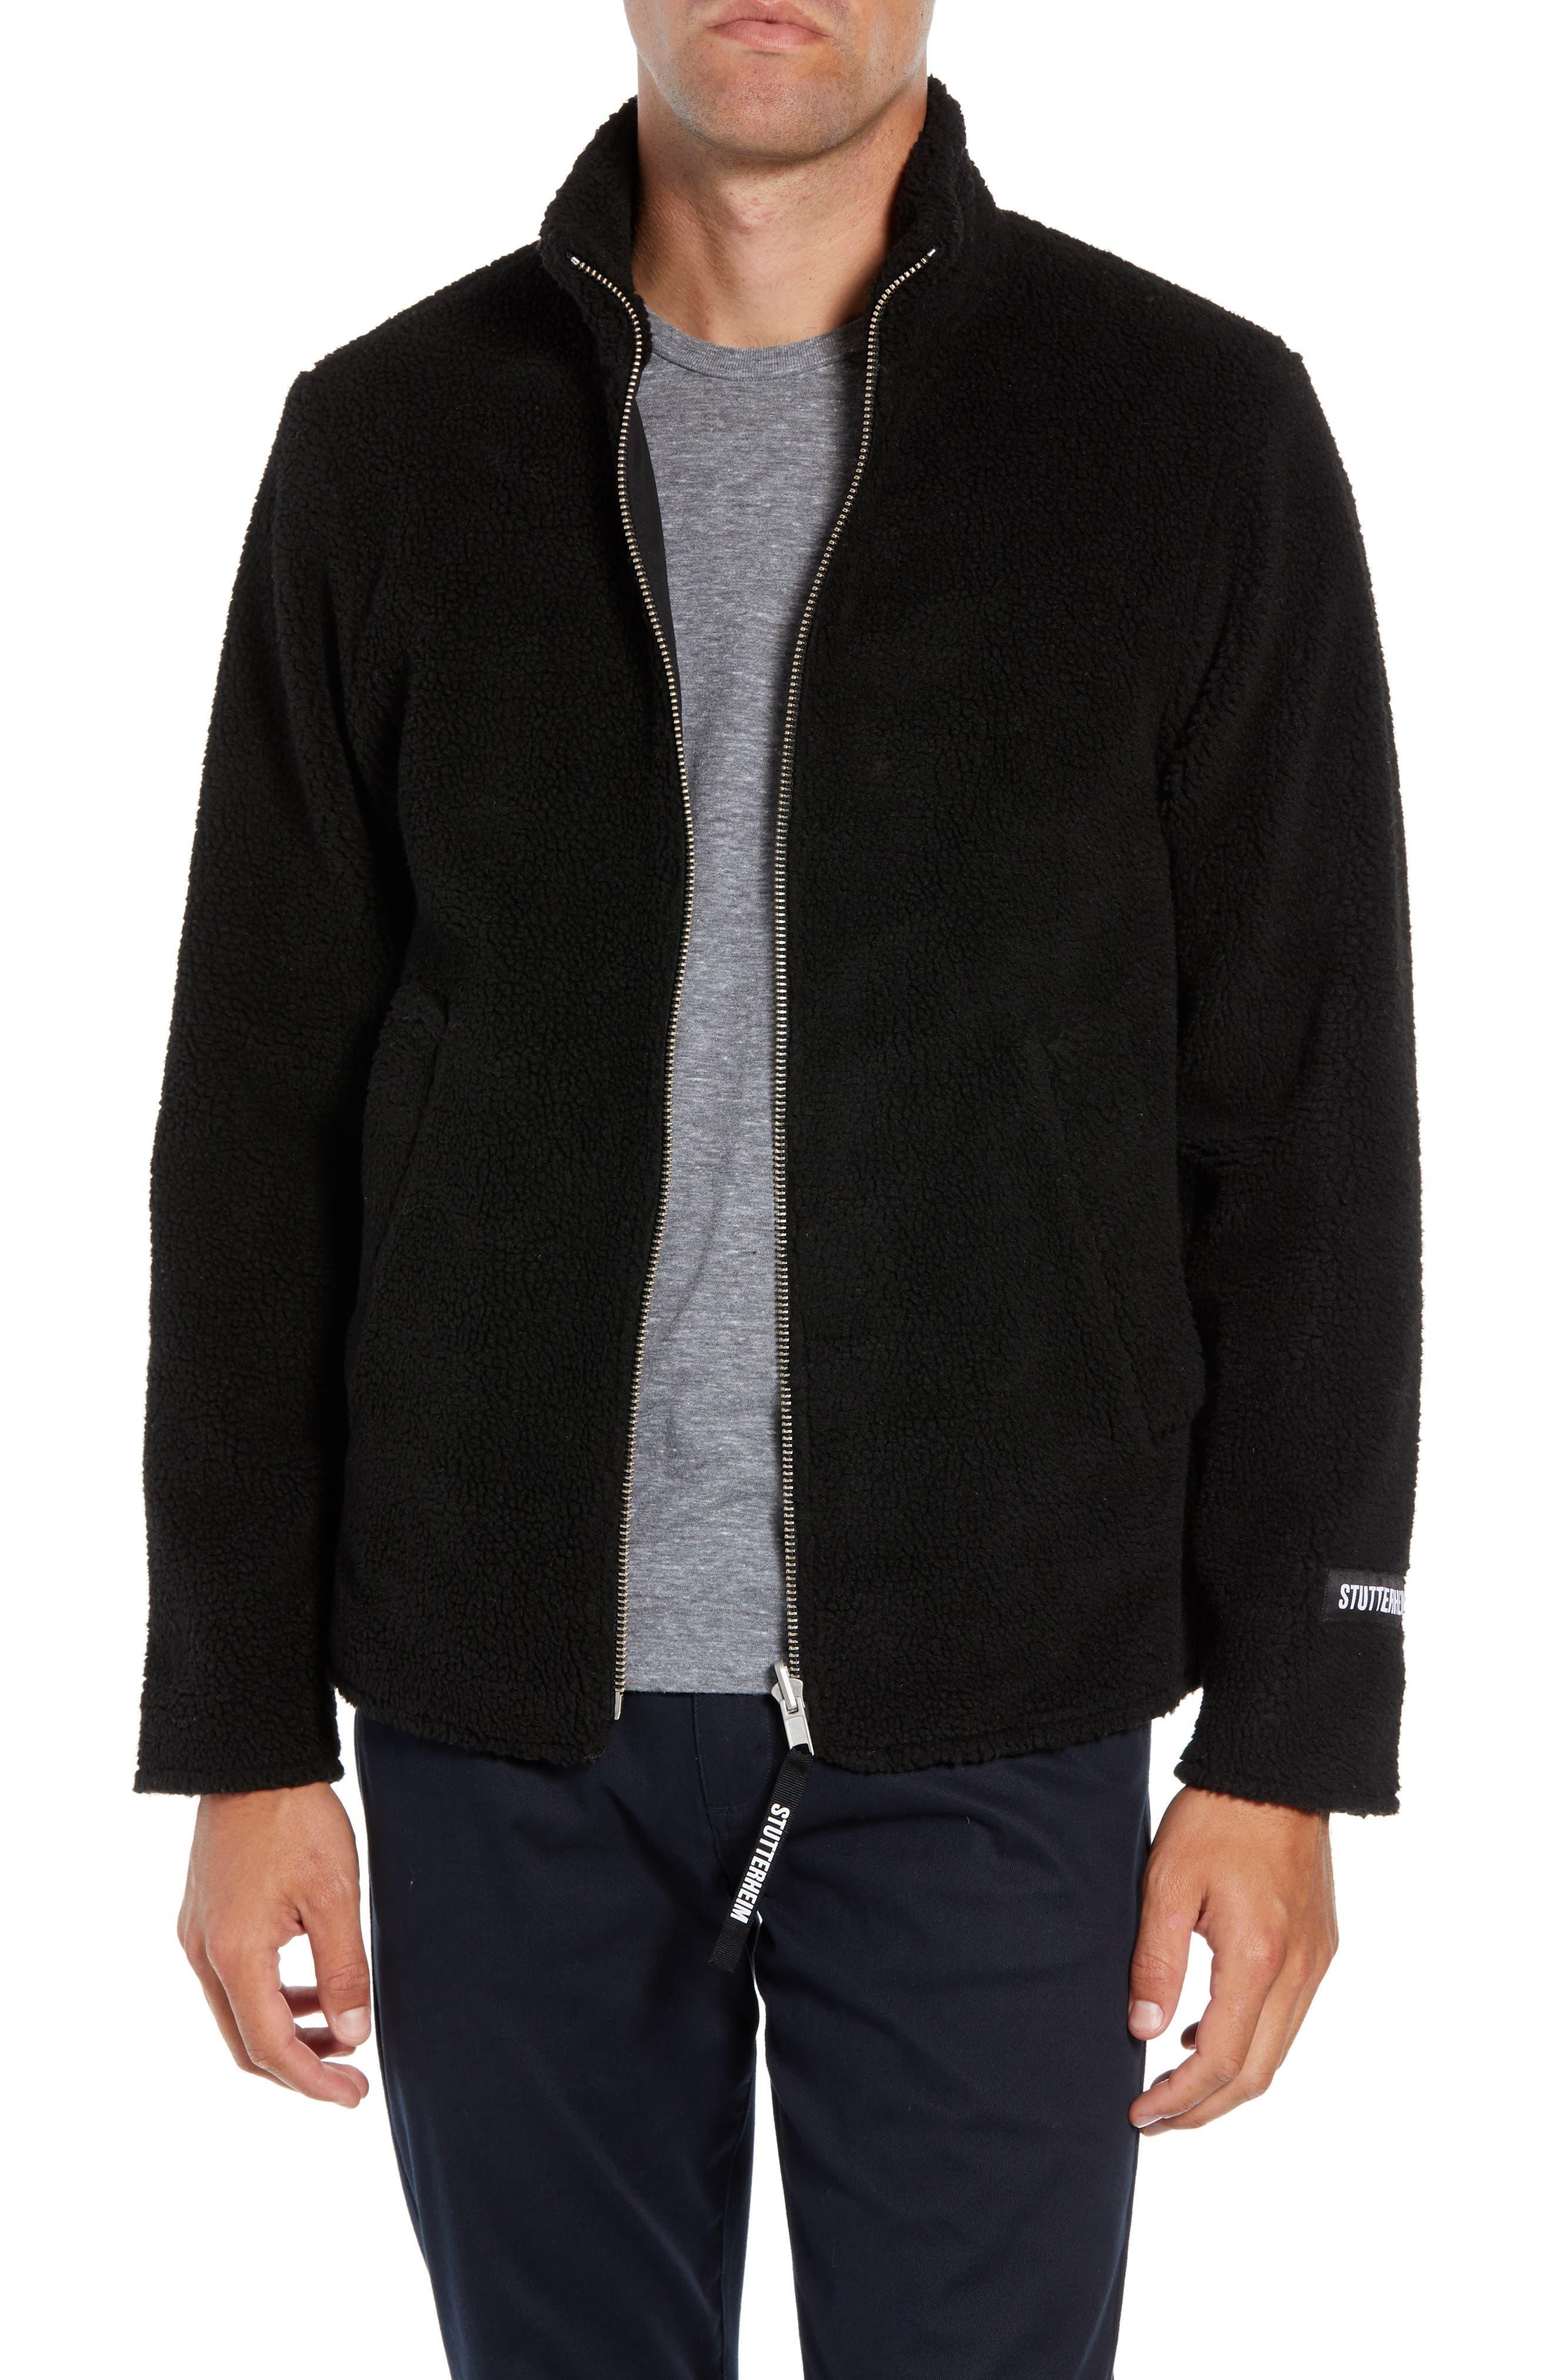 Varby Reversible Fleece Jacket,                             Main thumbnail 1, color,                             BLACK